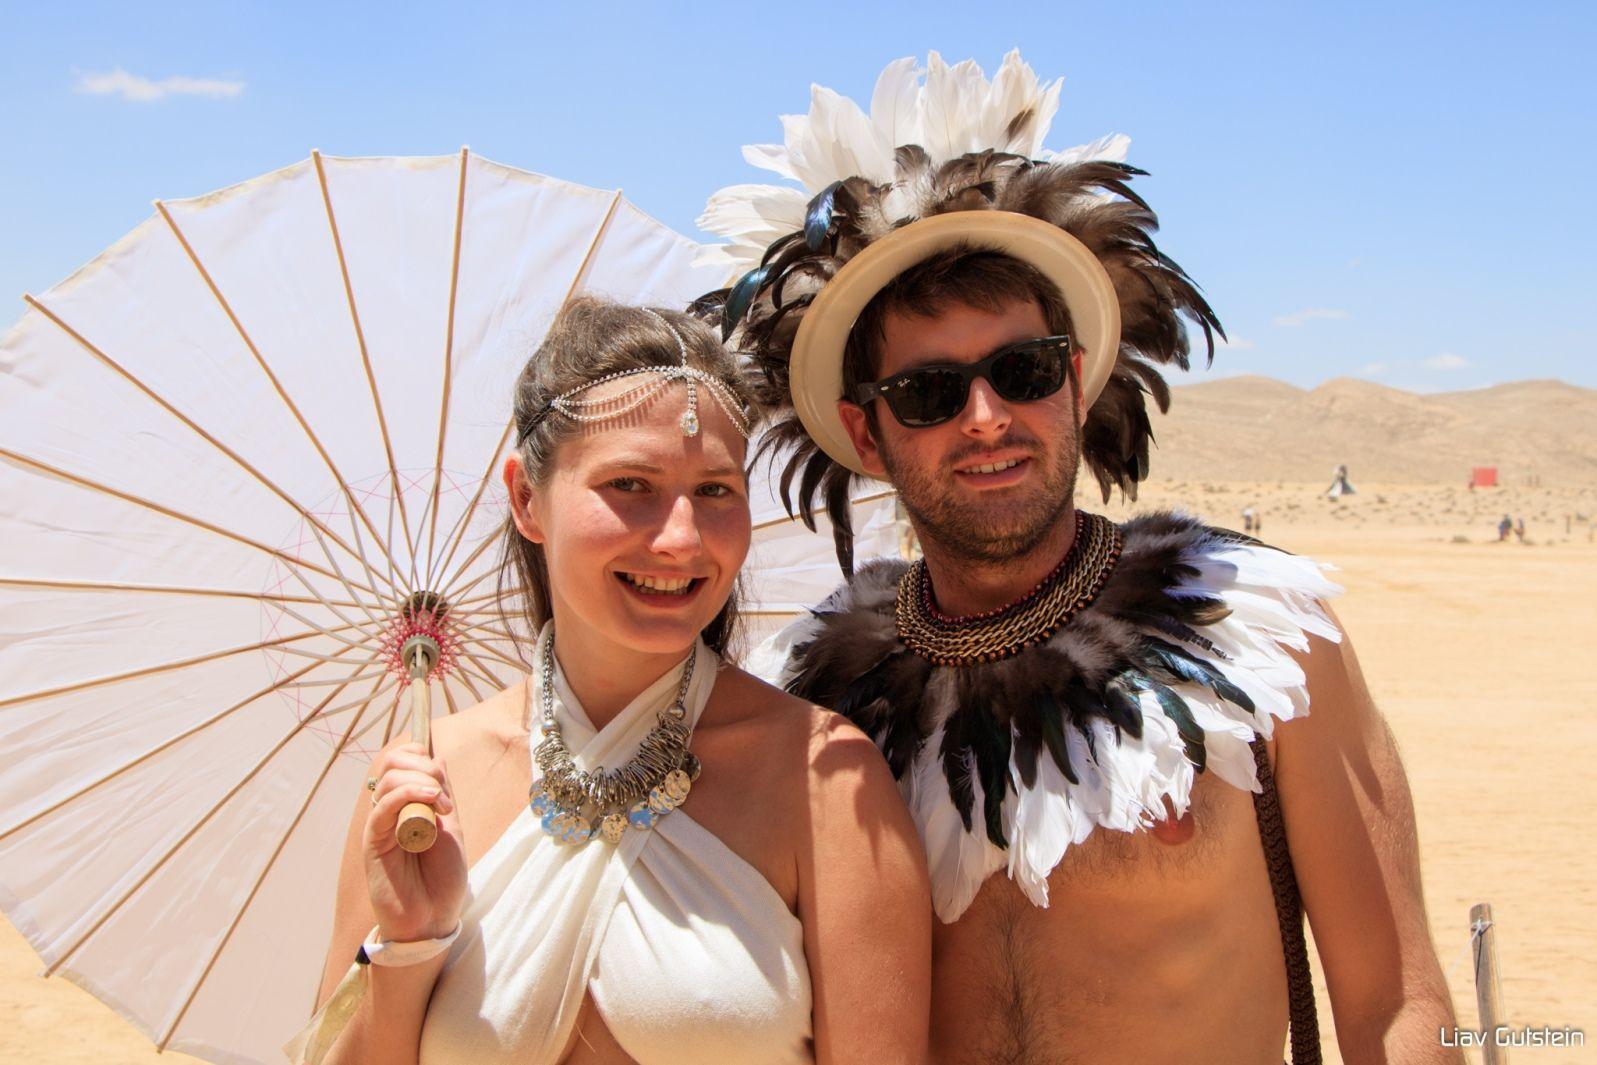 Midburn May Israel | Israel, Festival, Burning man